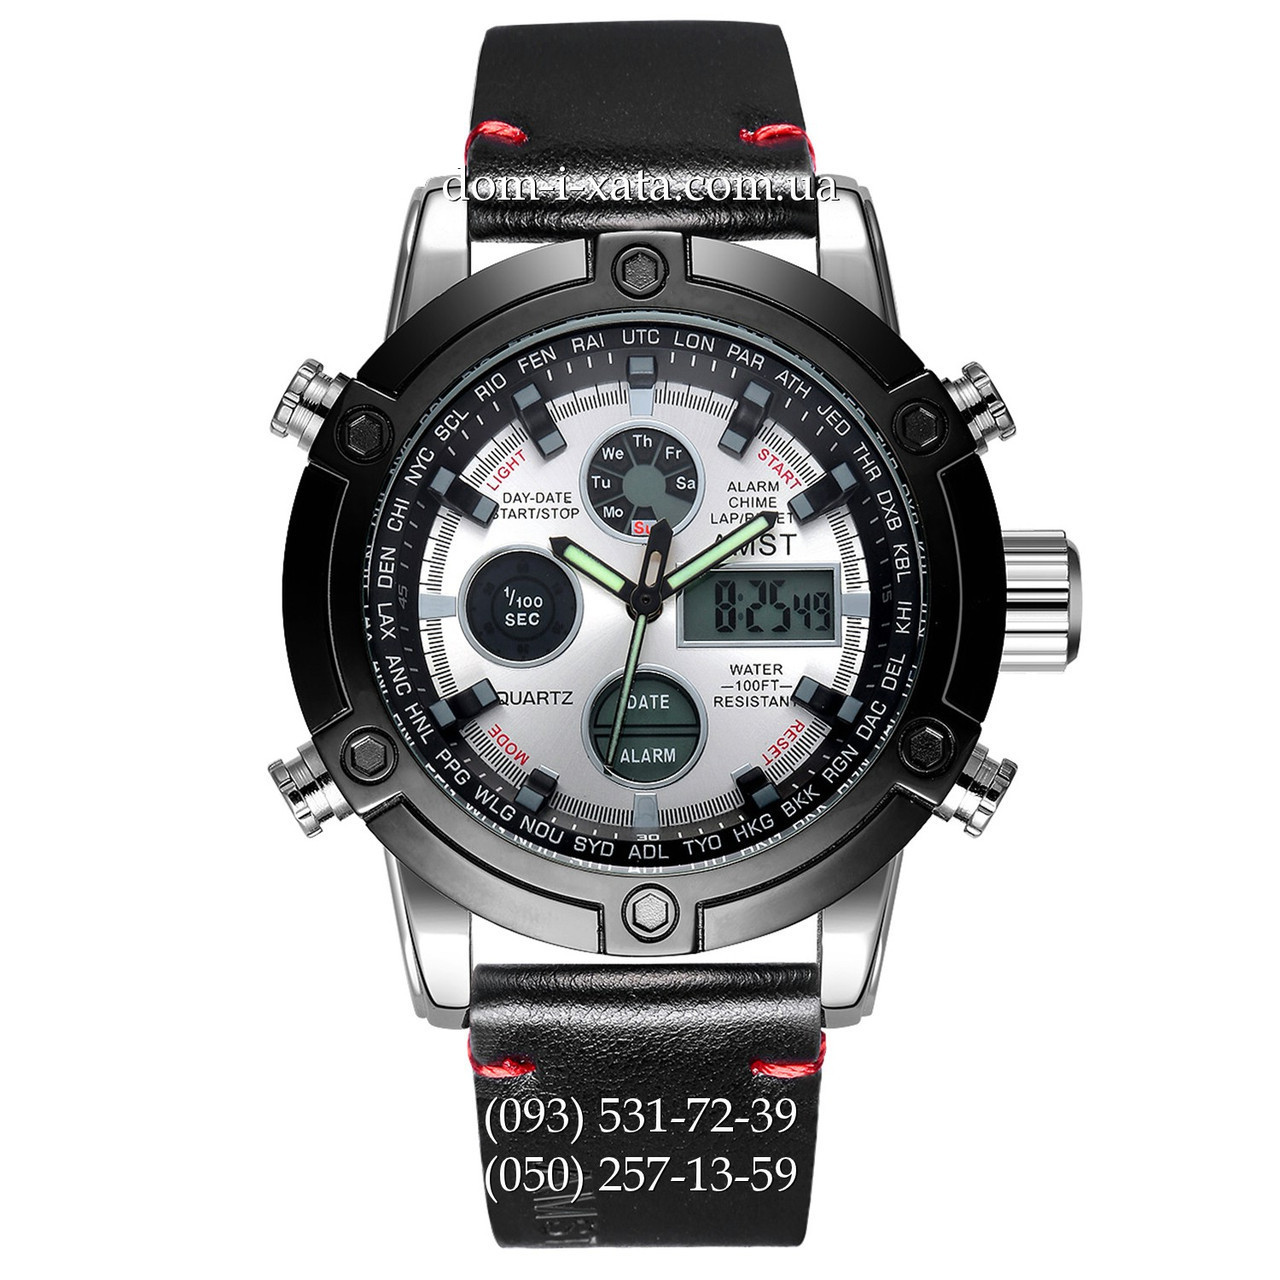 Армейские часы AMST 3022 Silver-Black-Silver Smooth Wristband, кварцевые, противоударные, армейские часы АМСТ, реплика, отличное качество!